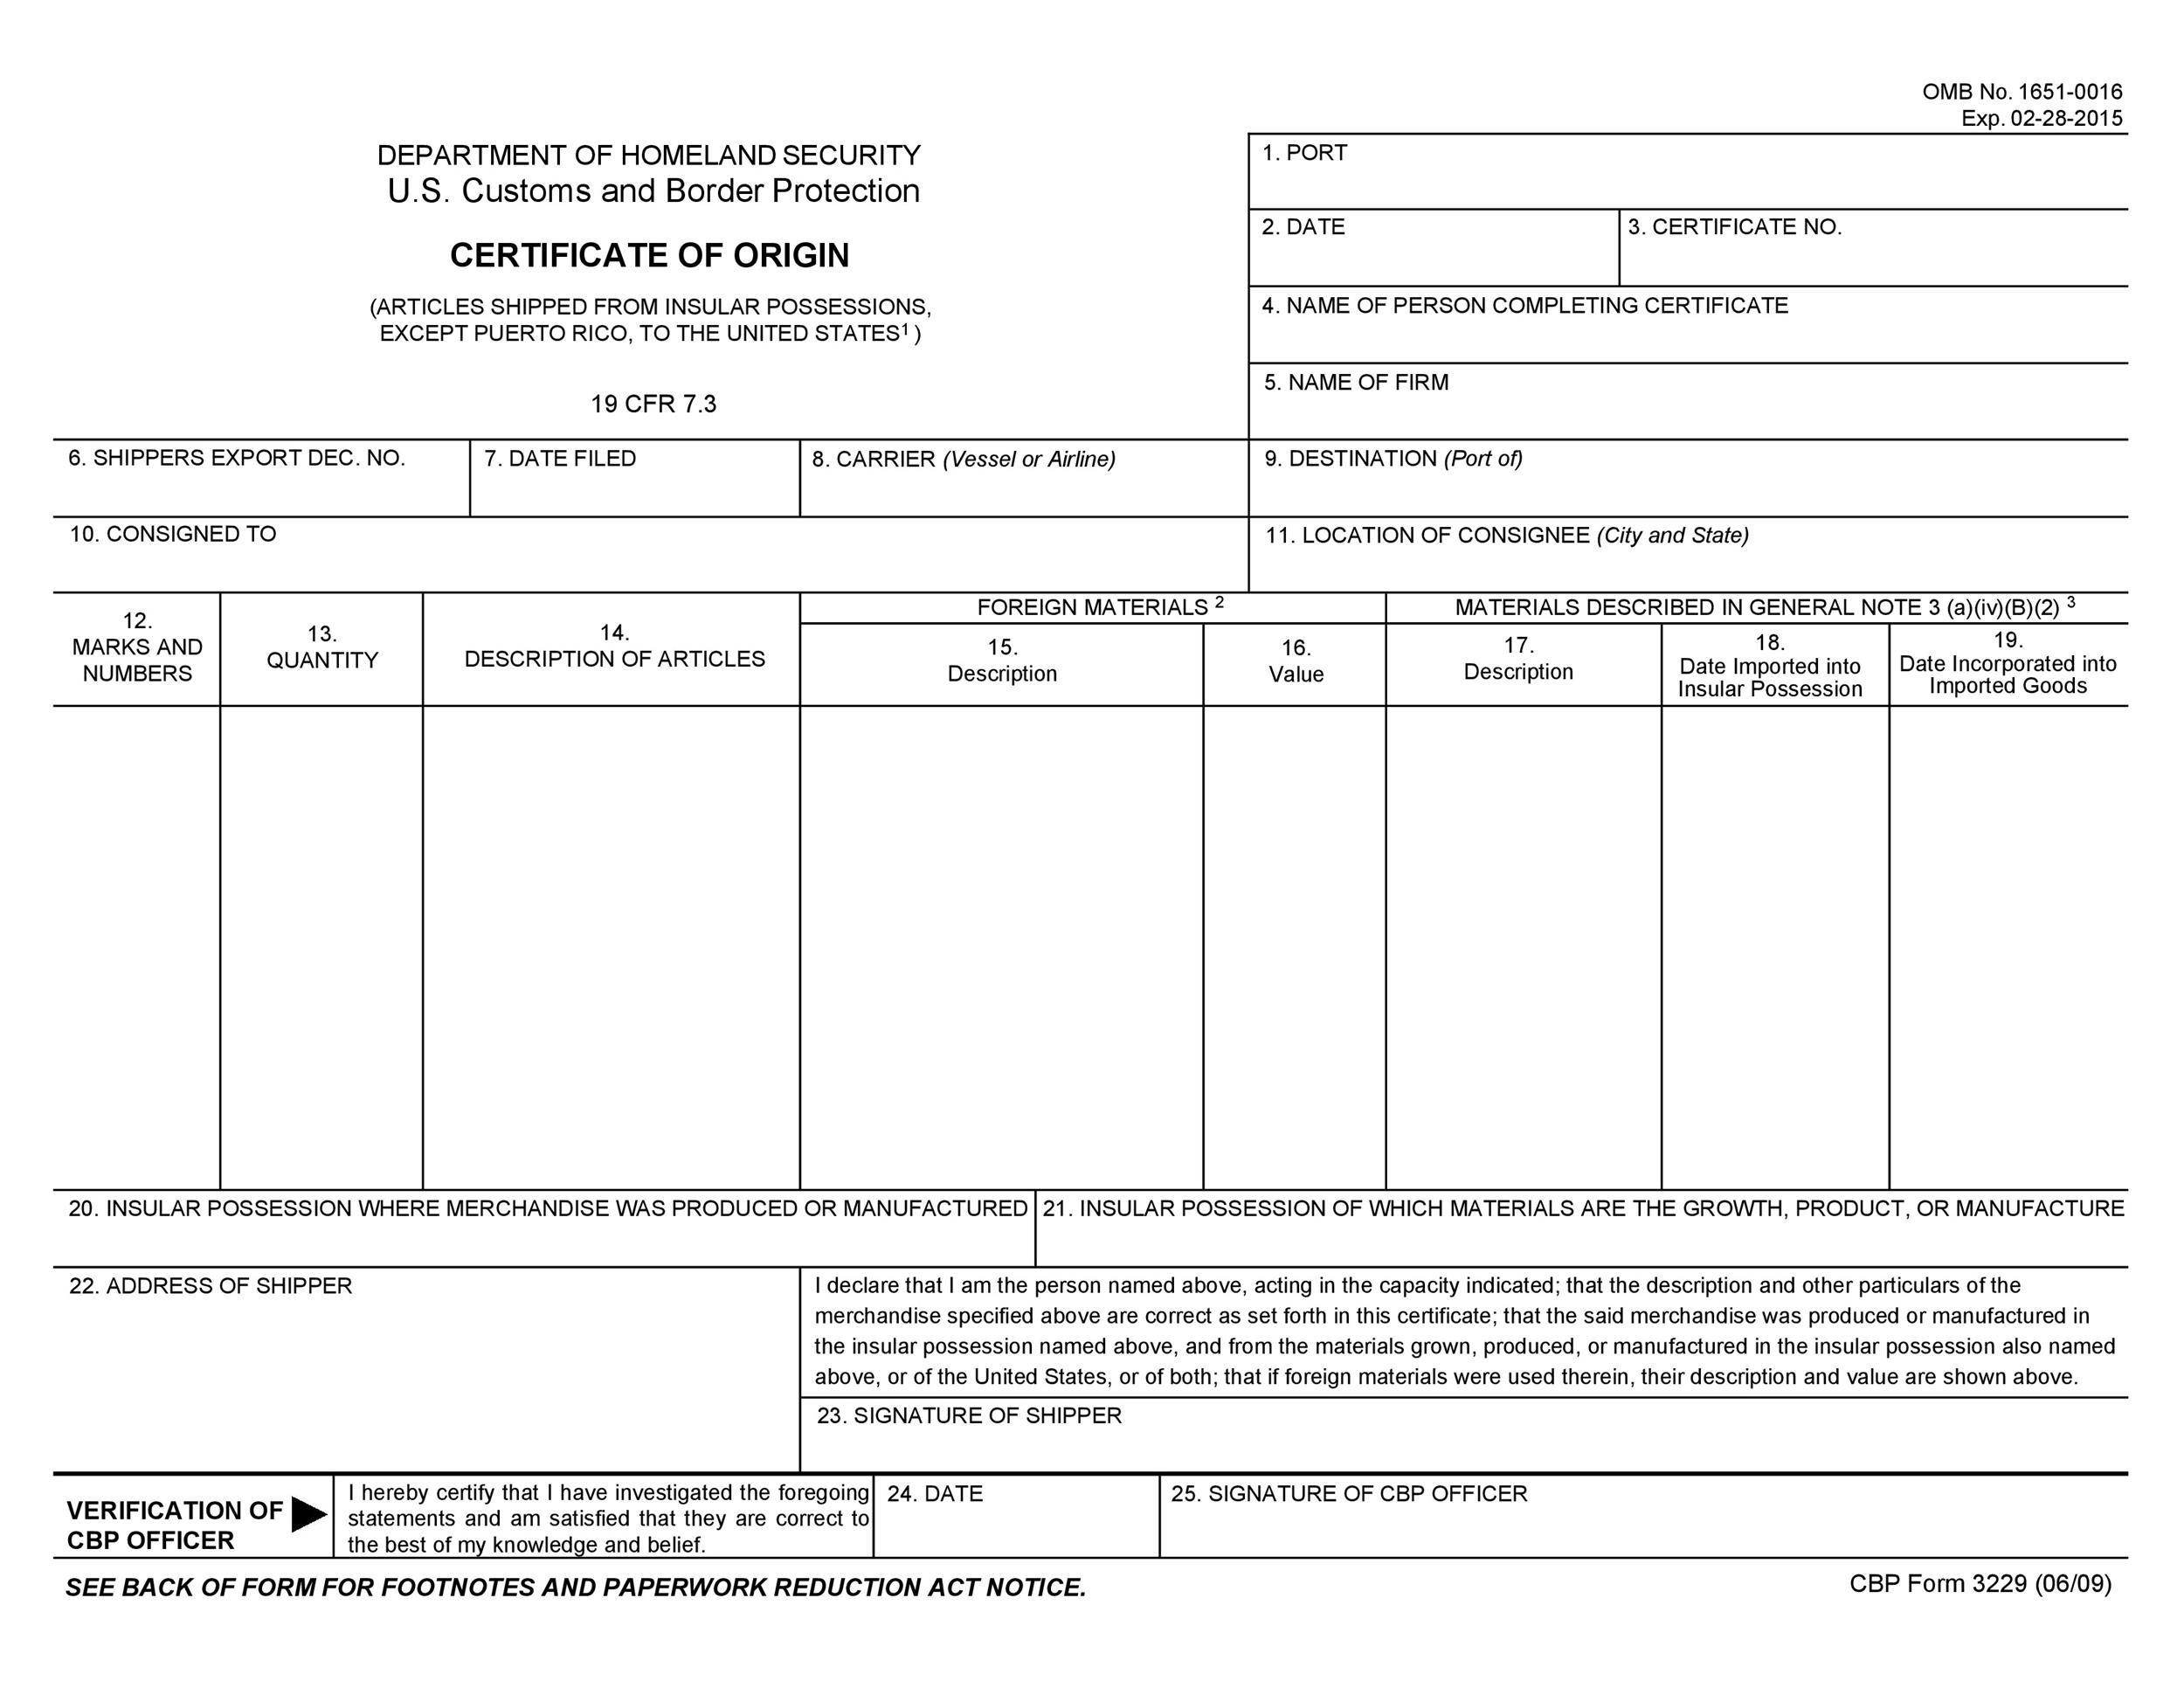 Free certificate of origin 31